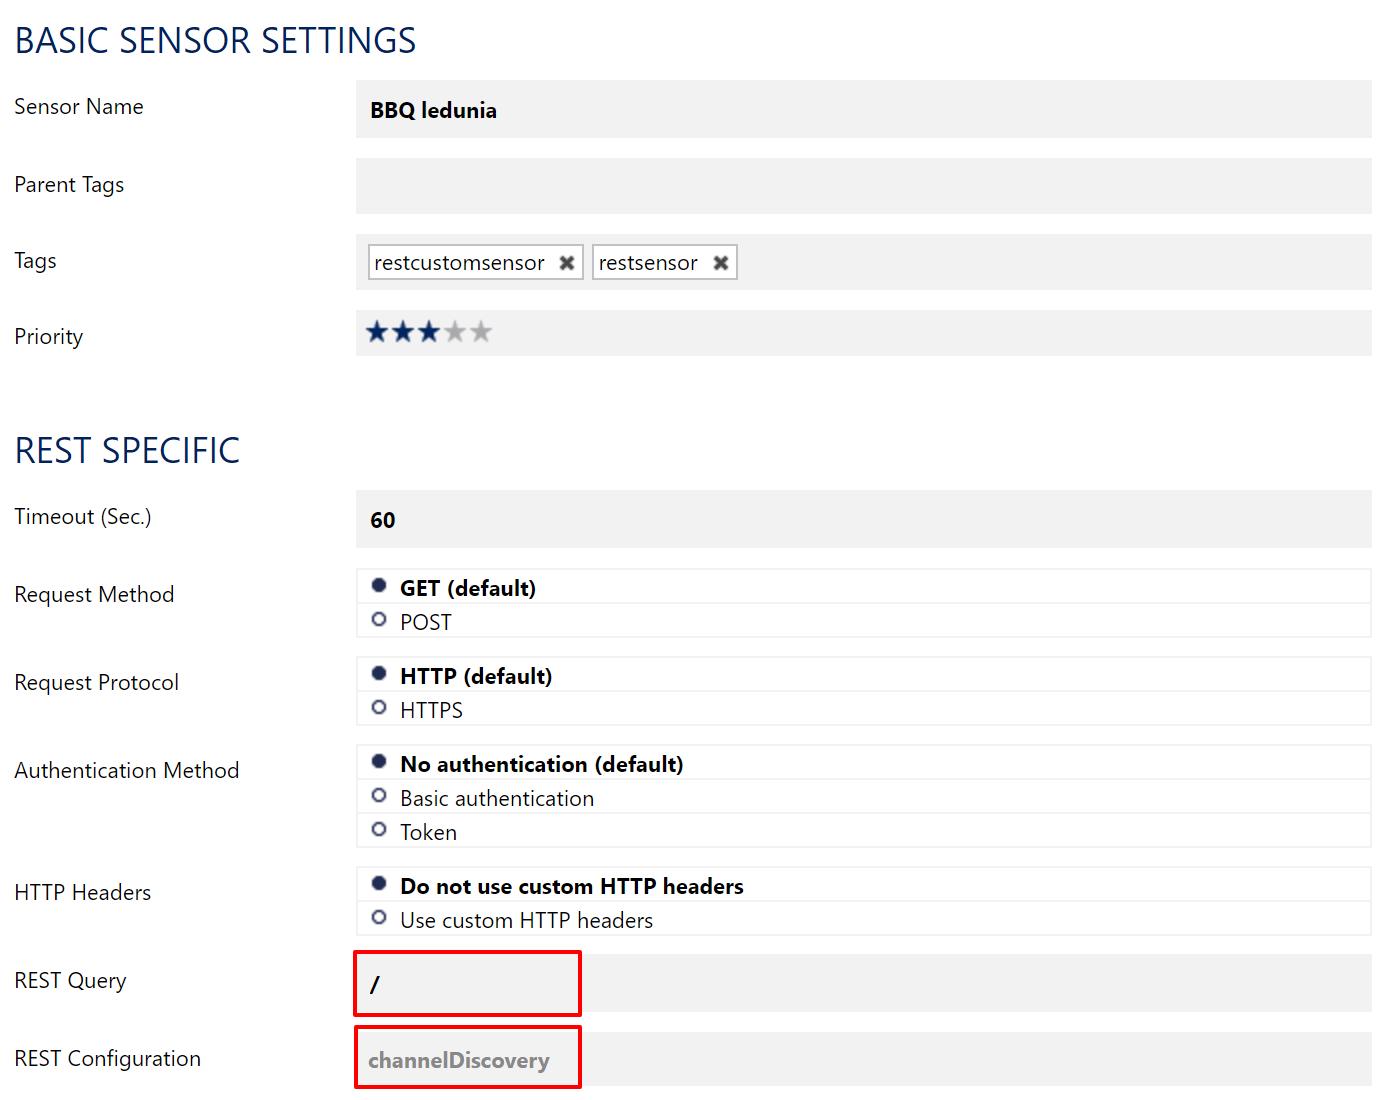 BBQ ledunia   Sensor Details   PRTG Network Monitor  WIN FMV9GQ089DS .png